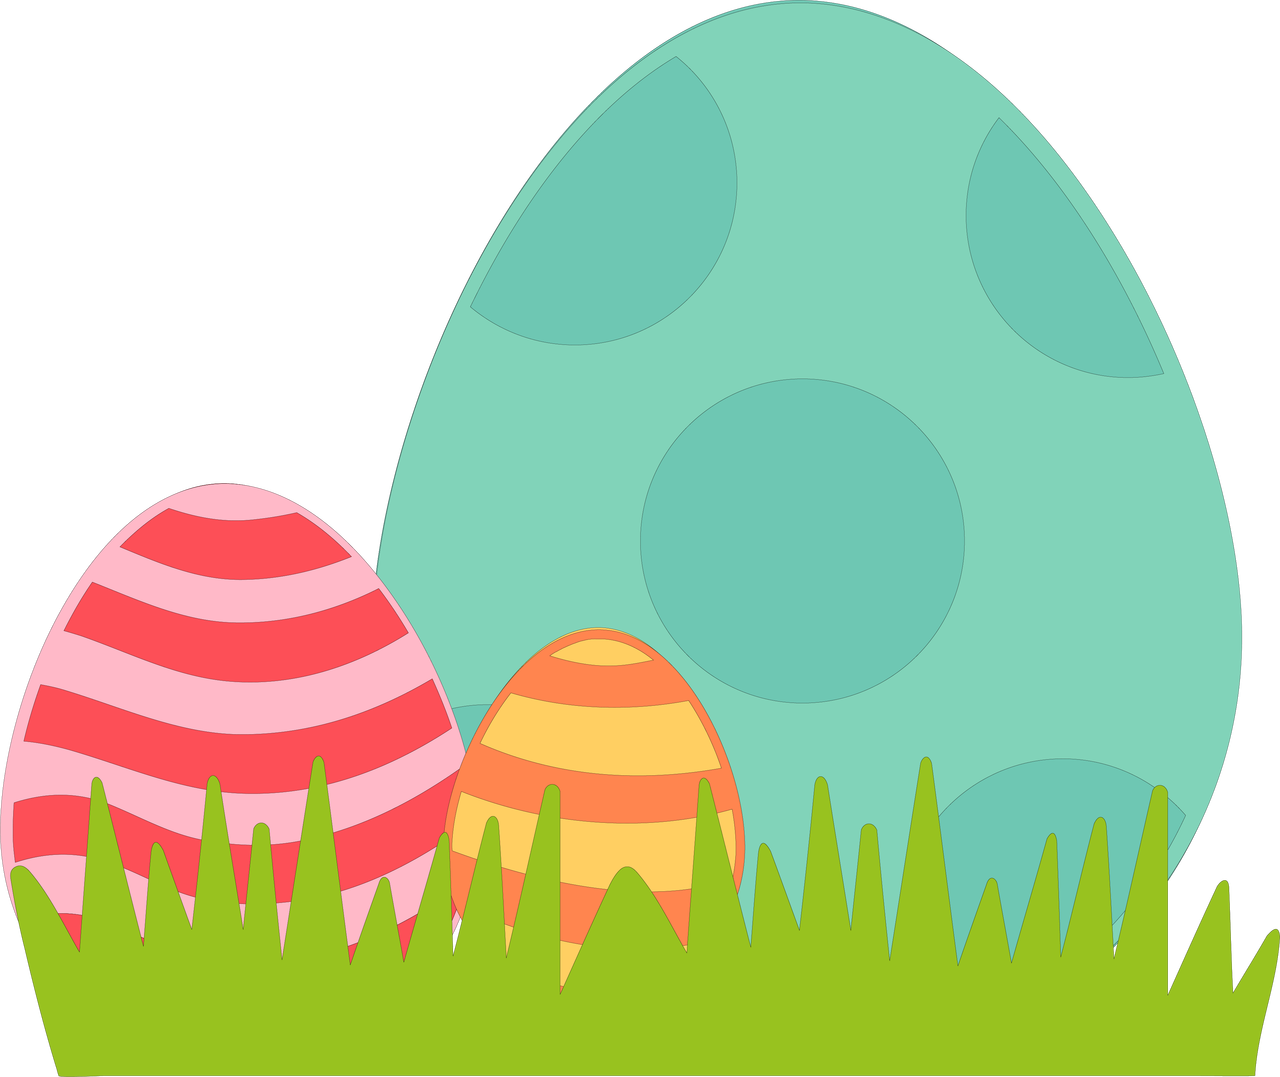 Easter Eggs SVG Cut File